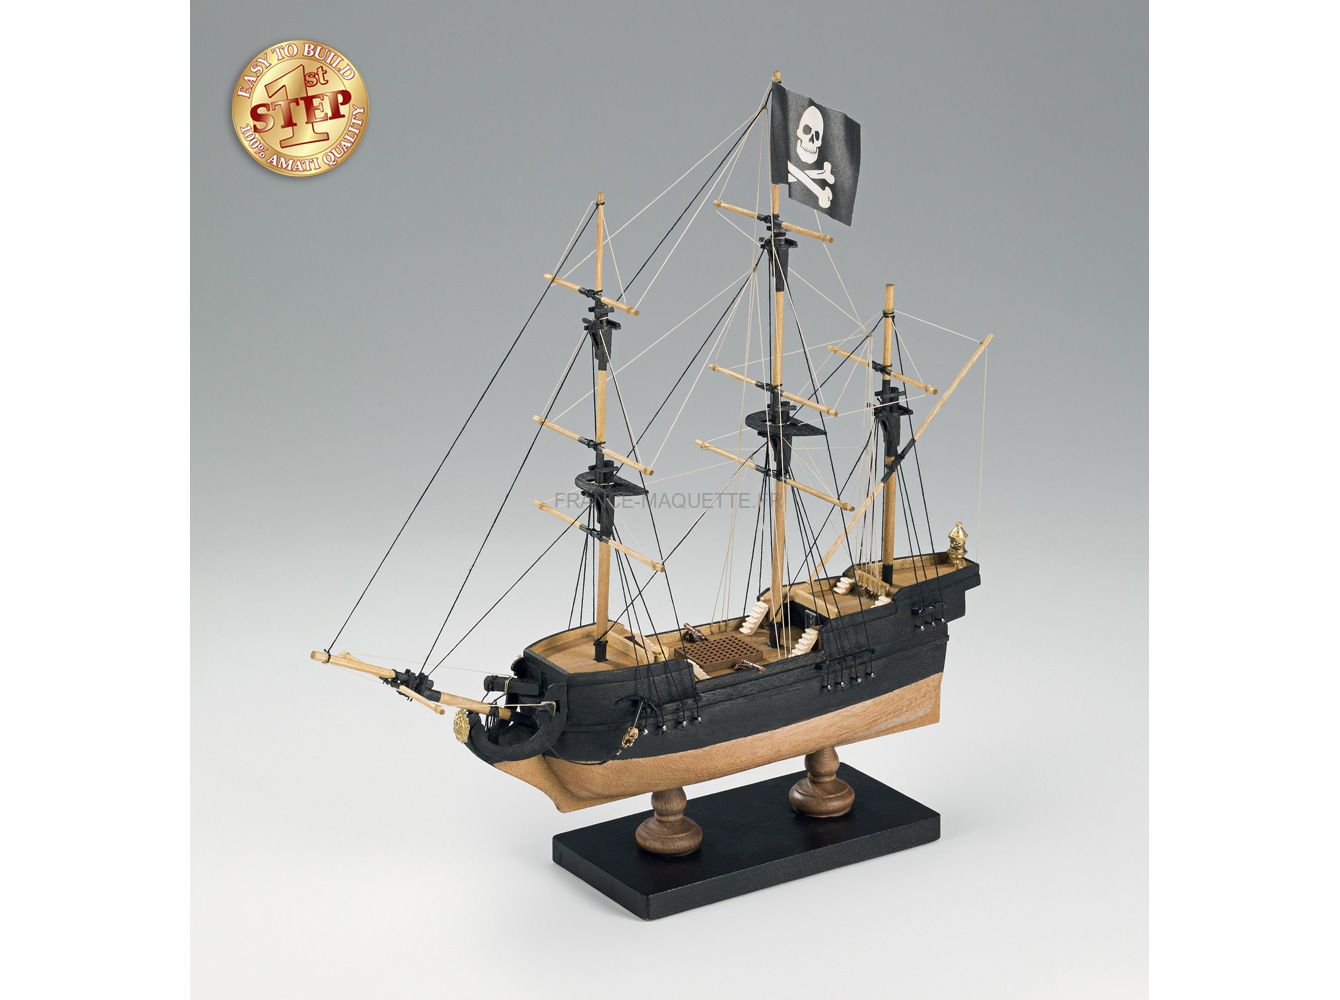 maquette bois bateau pirate 1 135 amati 600 01. Black Bedroom Furniture Sets. Home Design Ideas